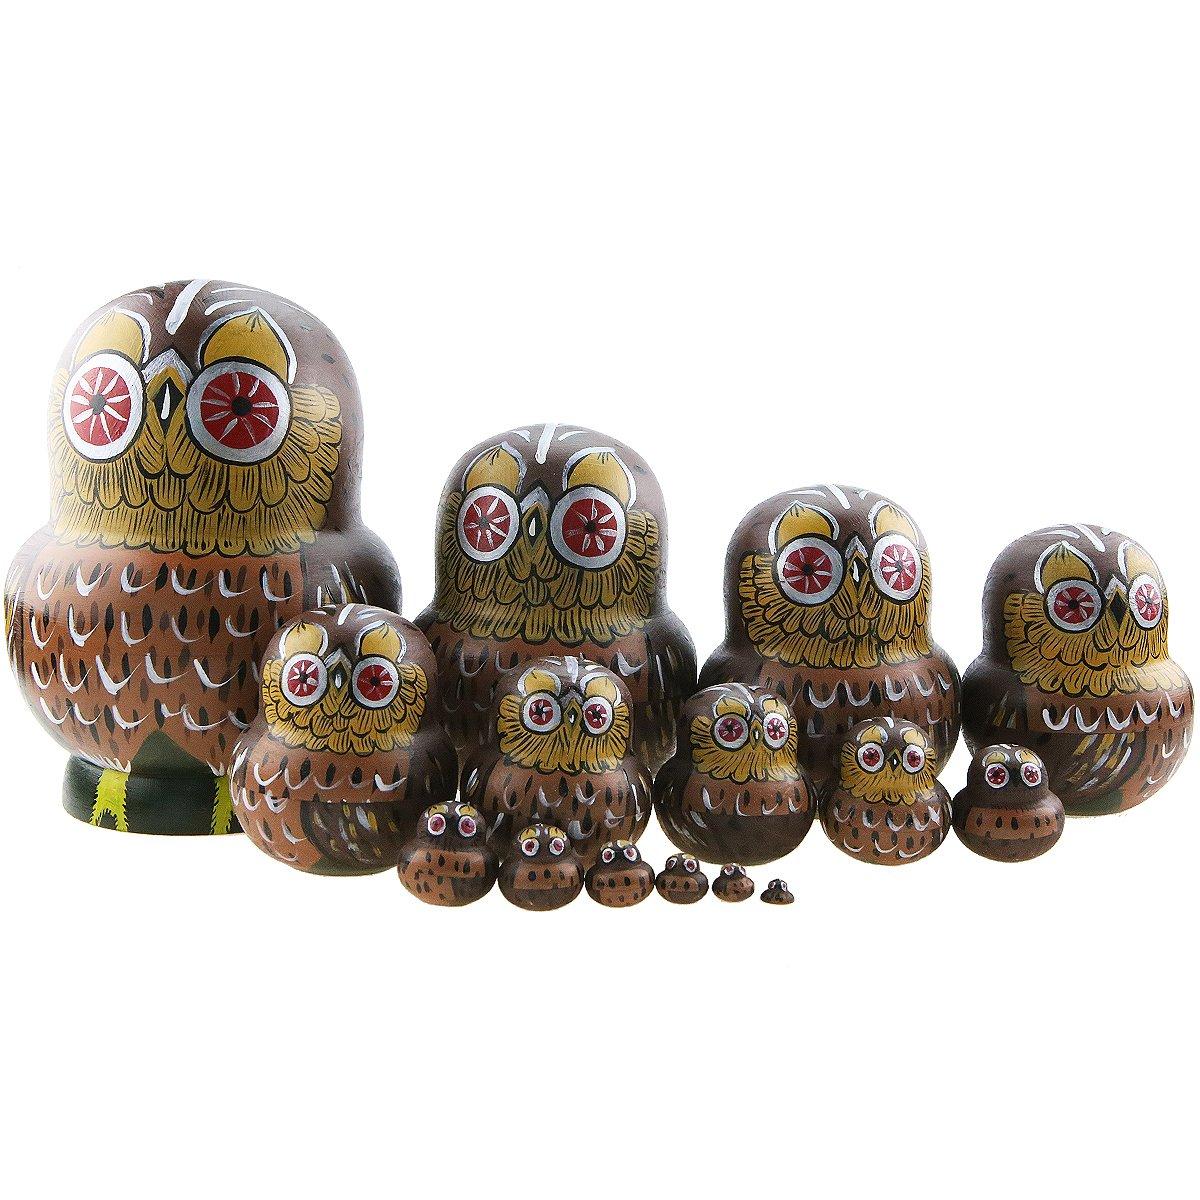 Winterworm Set of 15 Pieces Cartoon Brown Owl Russian Handmade Wooden Nesting Dolls Matryoshka Dolls for Birthday Christmas New Year Gift Home Decoration Kids Toy by Winterworm (Image #3)